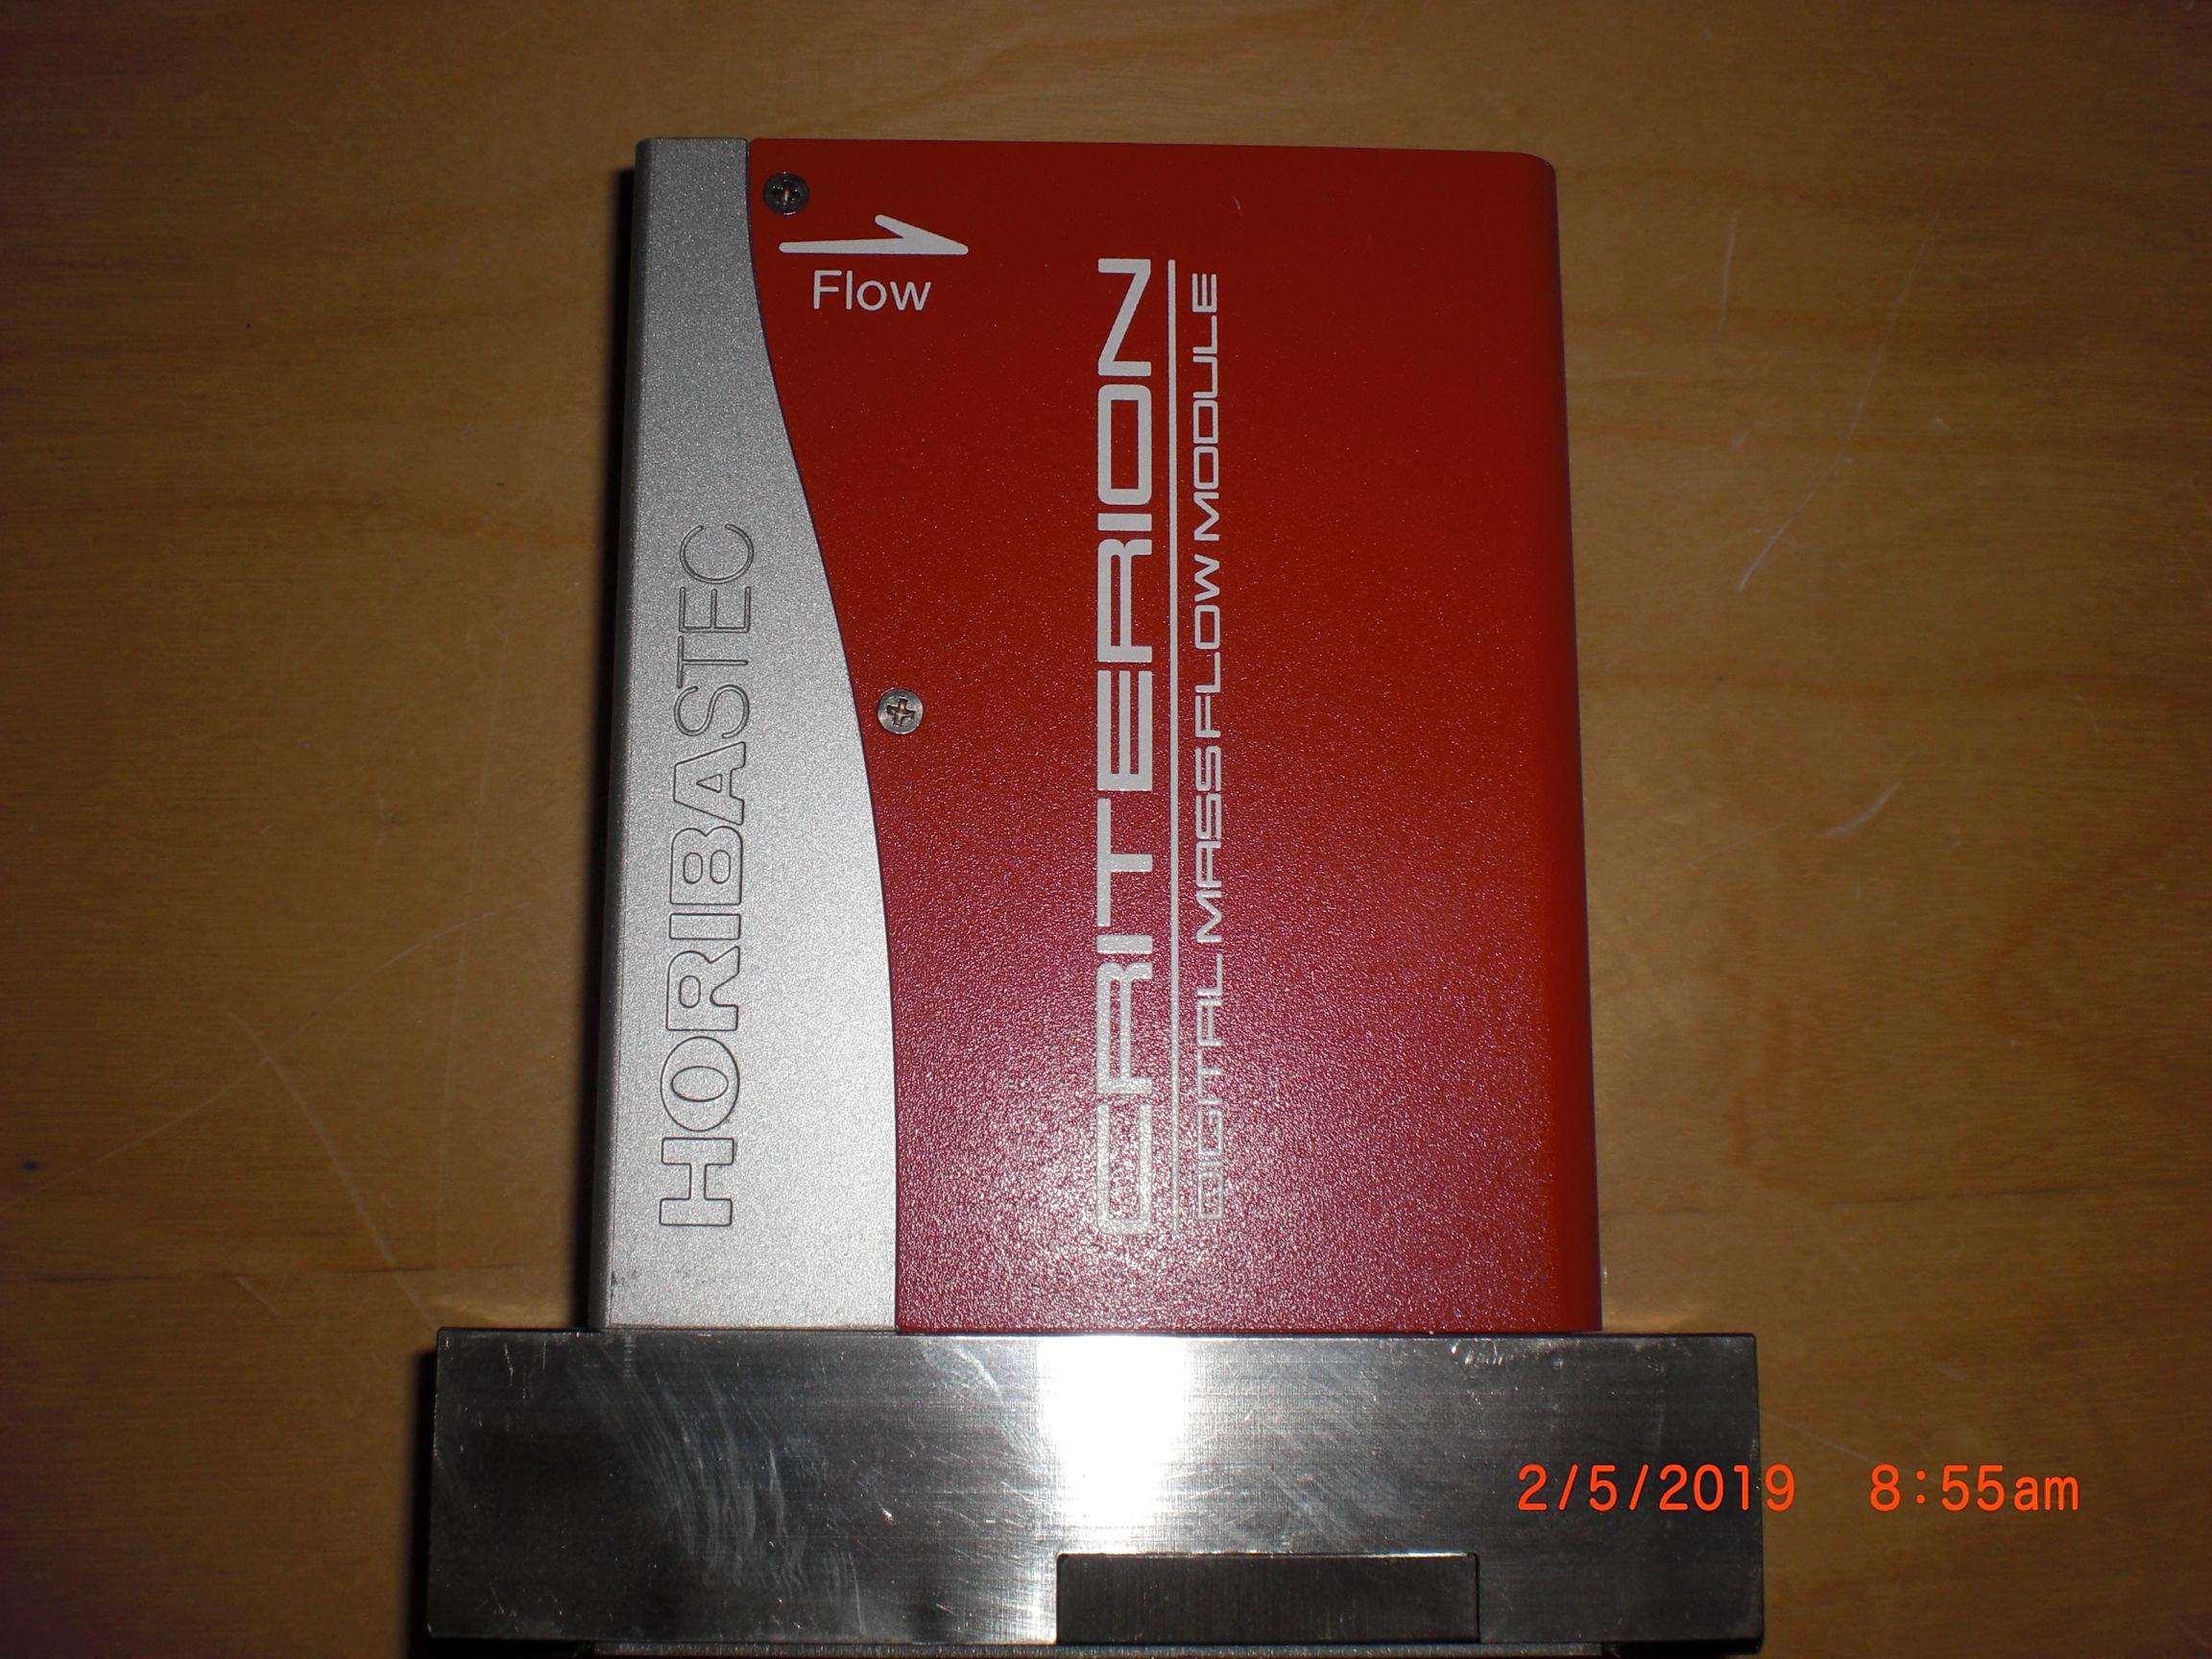 MFC HOREBIA / STEC D213-SCT-C4F8-150sccm LAM Reasearch (LAM) 788-170129-150